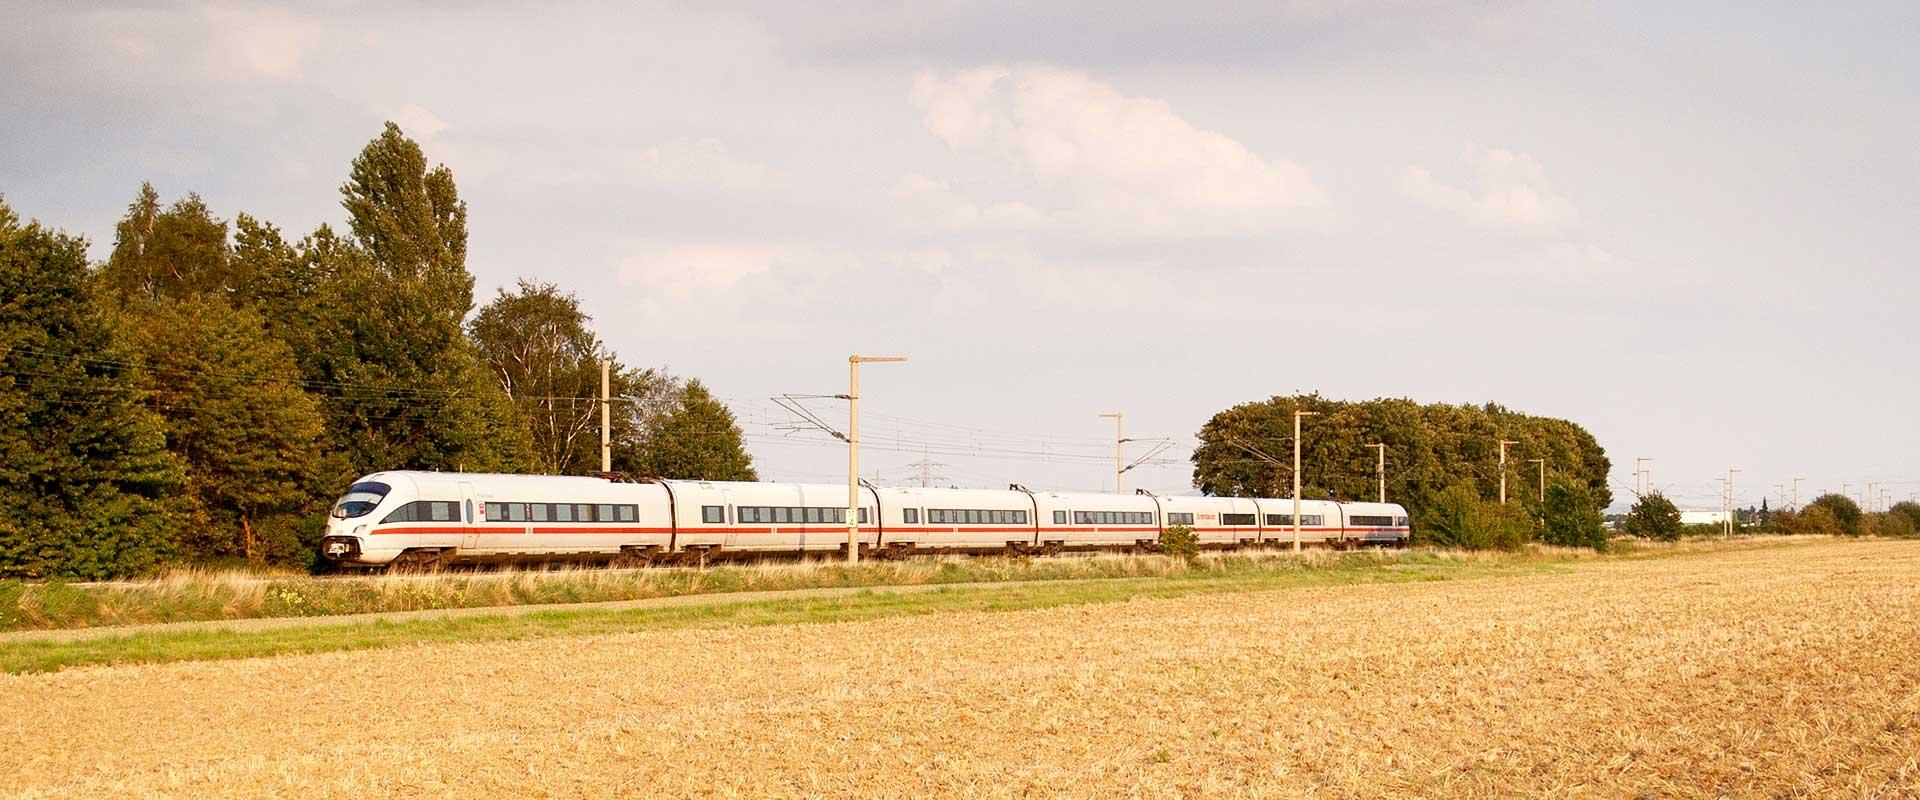 Trem de Frankfurt para Colônia